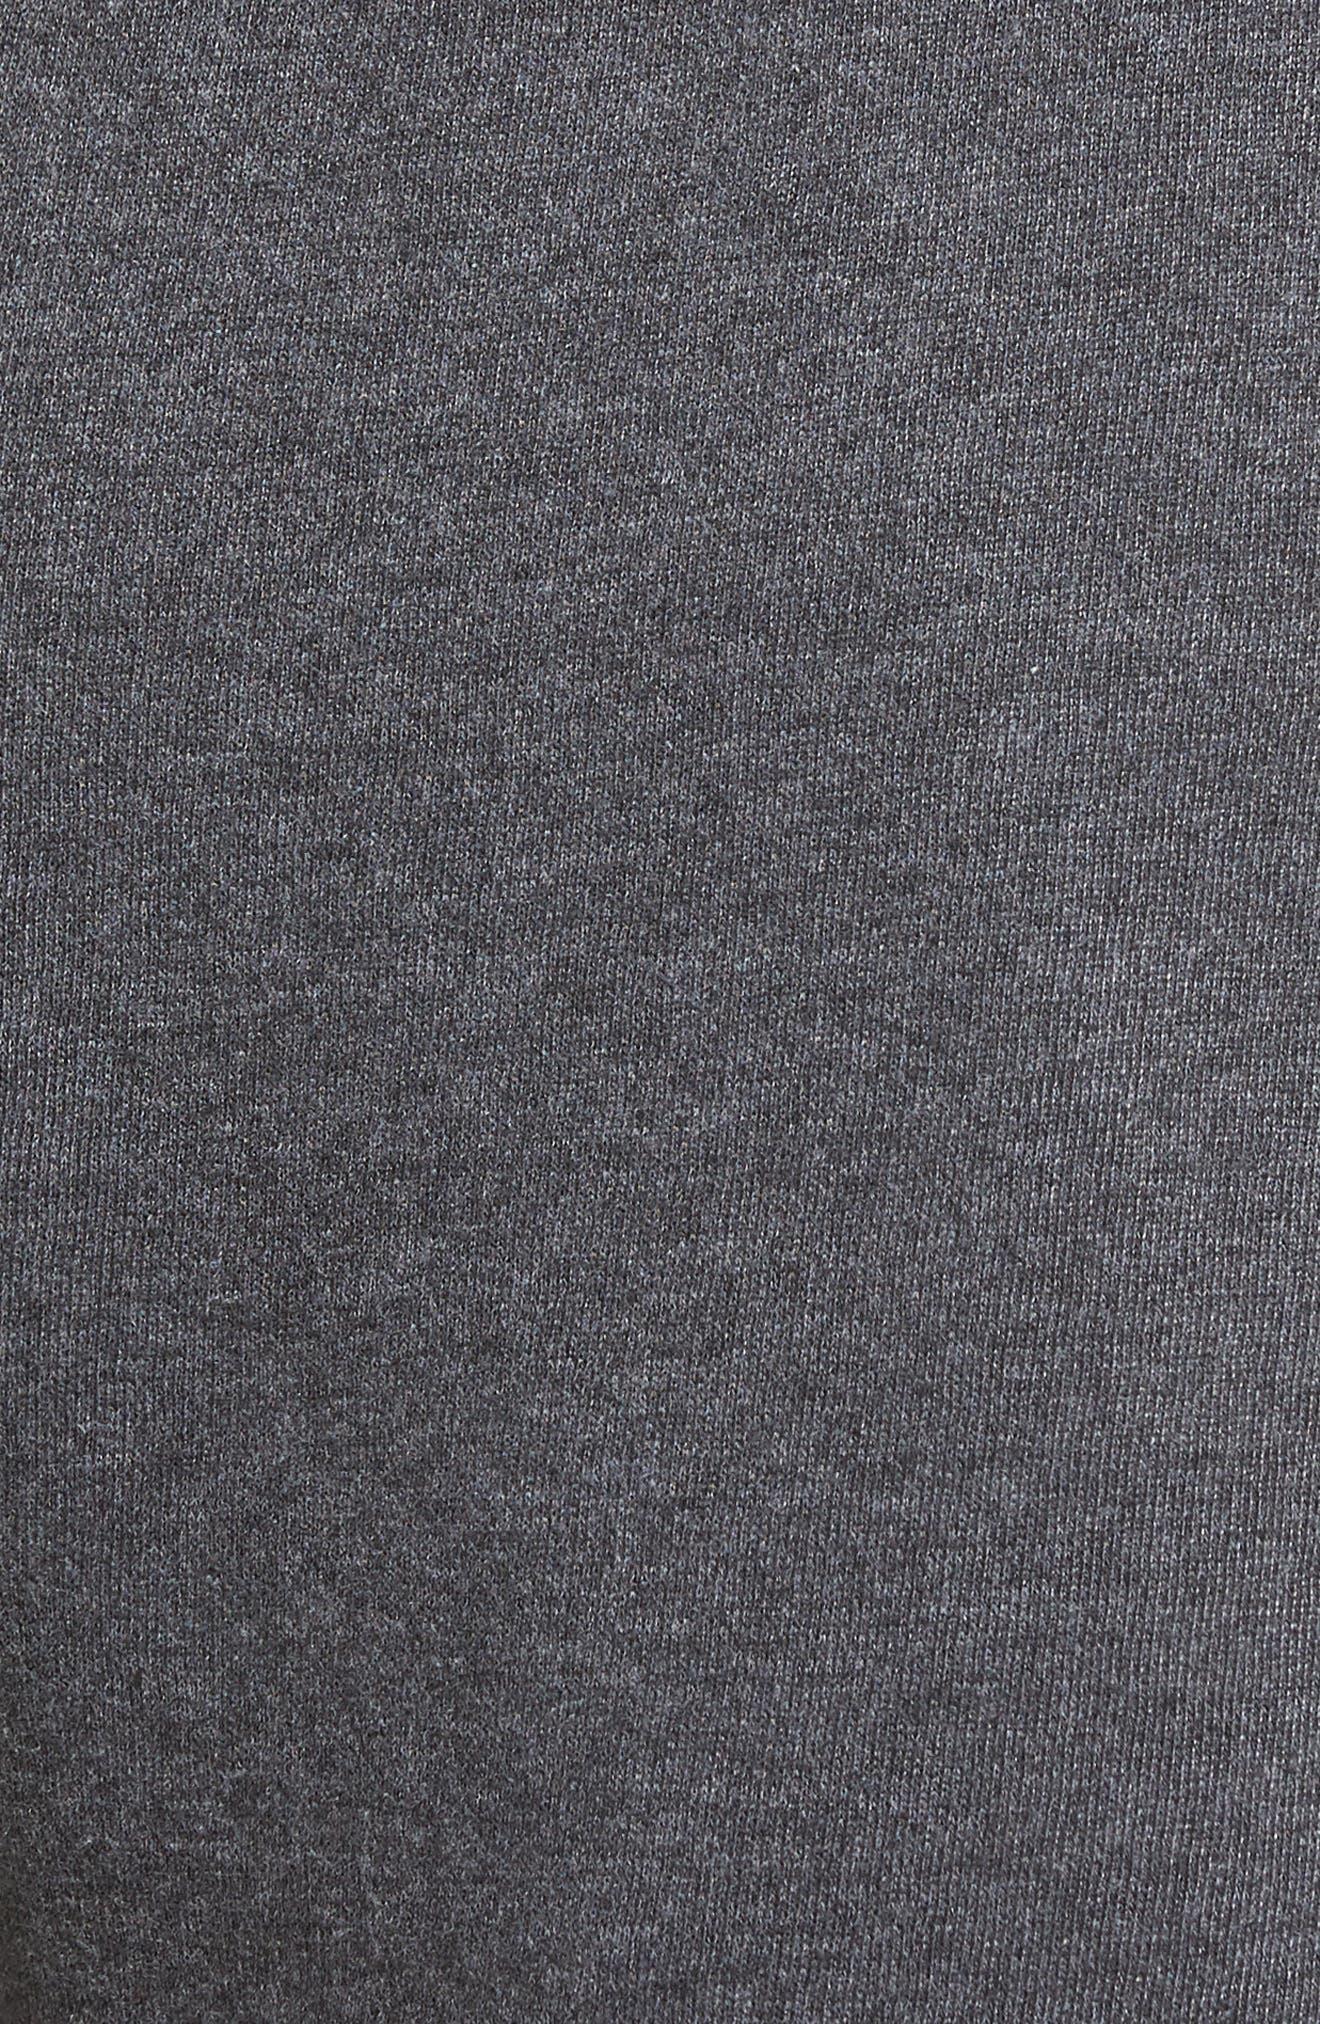 Reflective Never Stop Pants,                             Alternate thumbnail 5, color,                             Dark Grey Hthr/Monument Grey